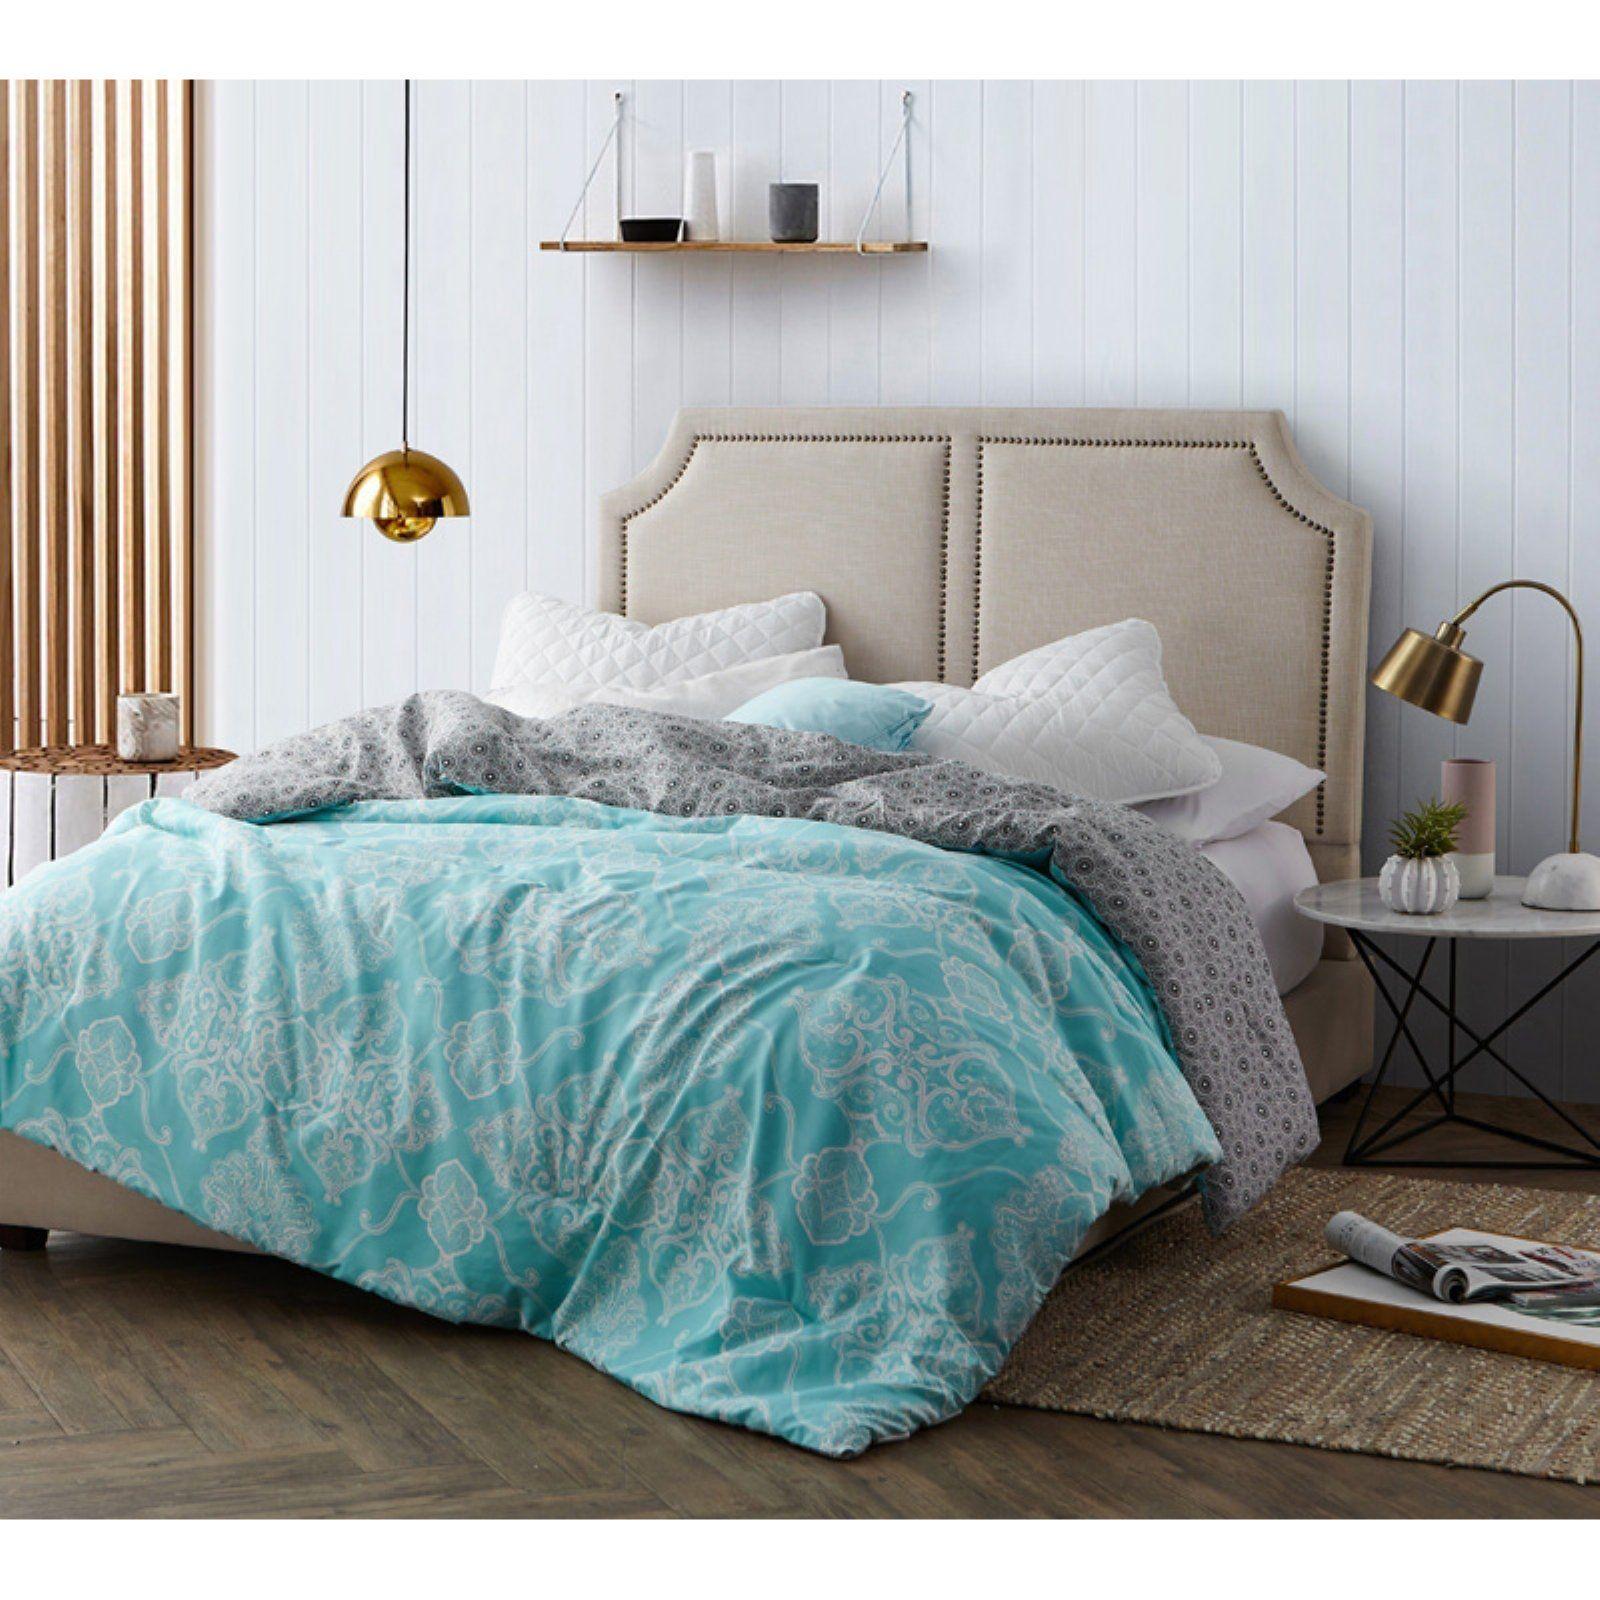 Alberobella Minty Aqua Comforter By Byourbed Aqua Comforter